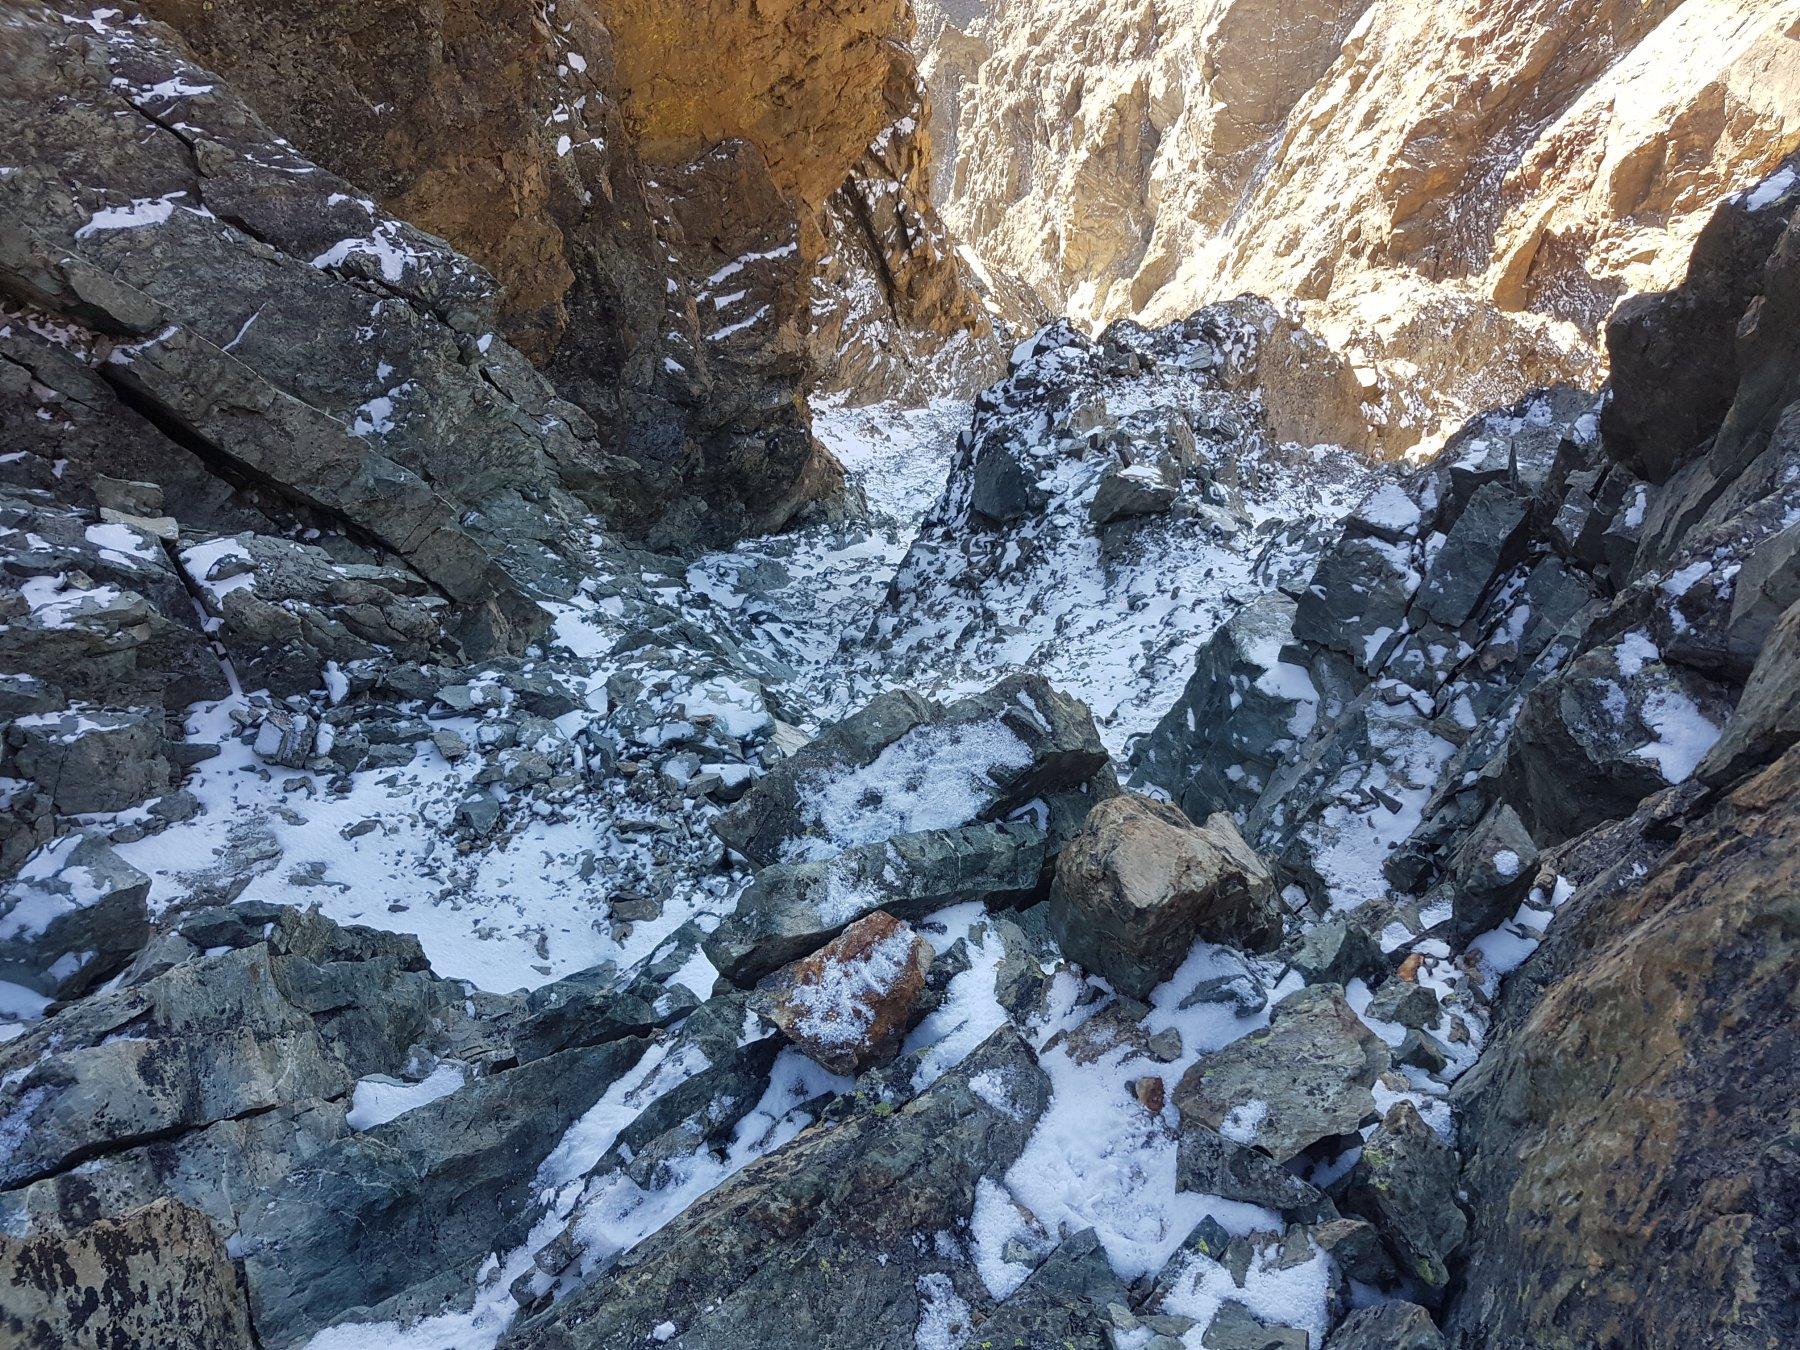 neve sull'aggiramento del Saint Robert